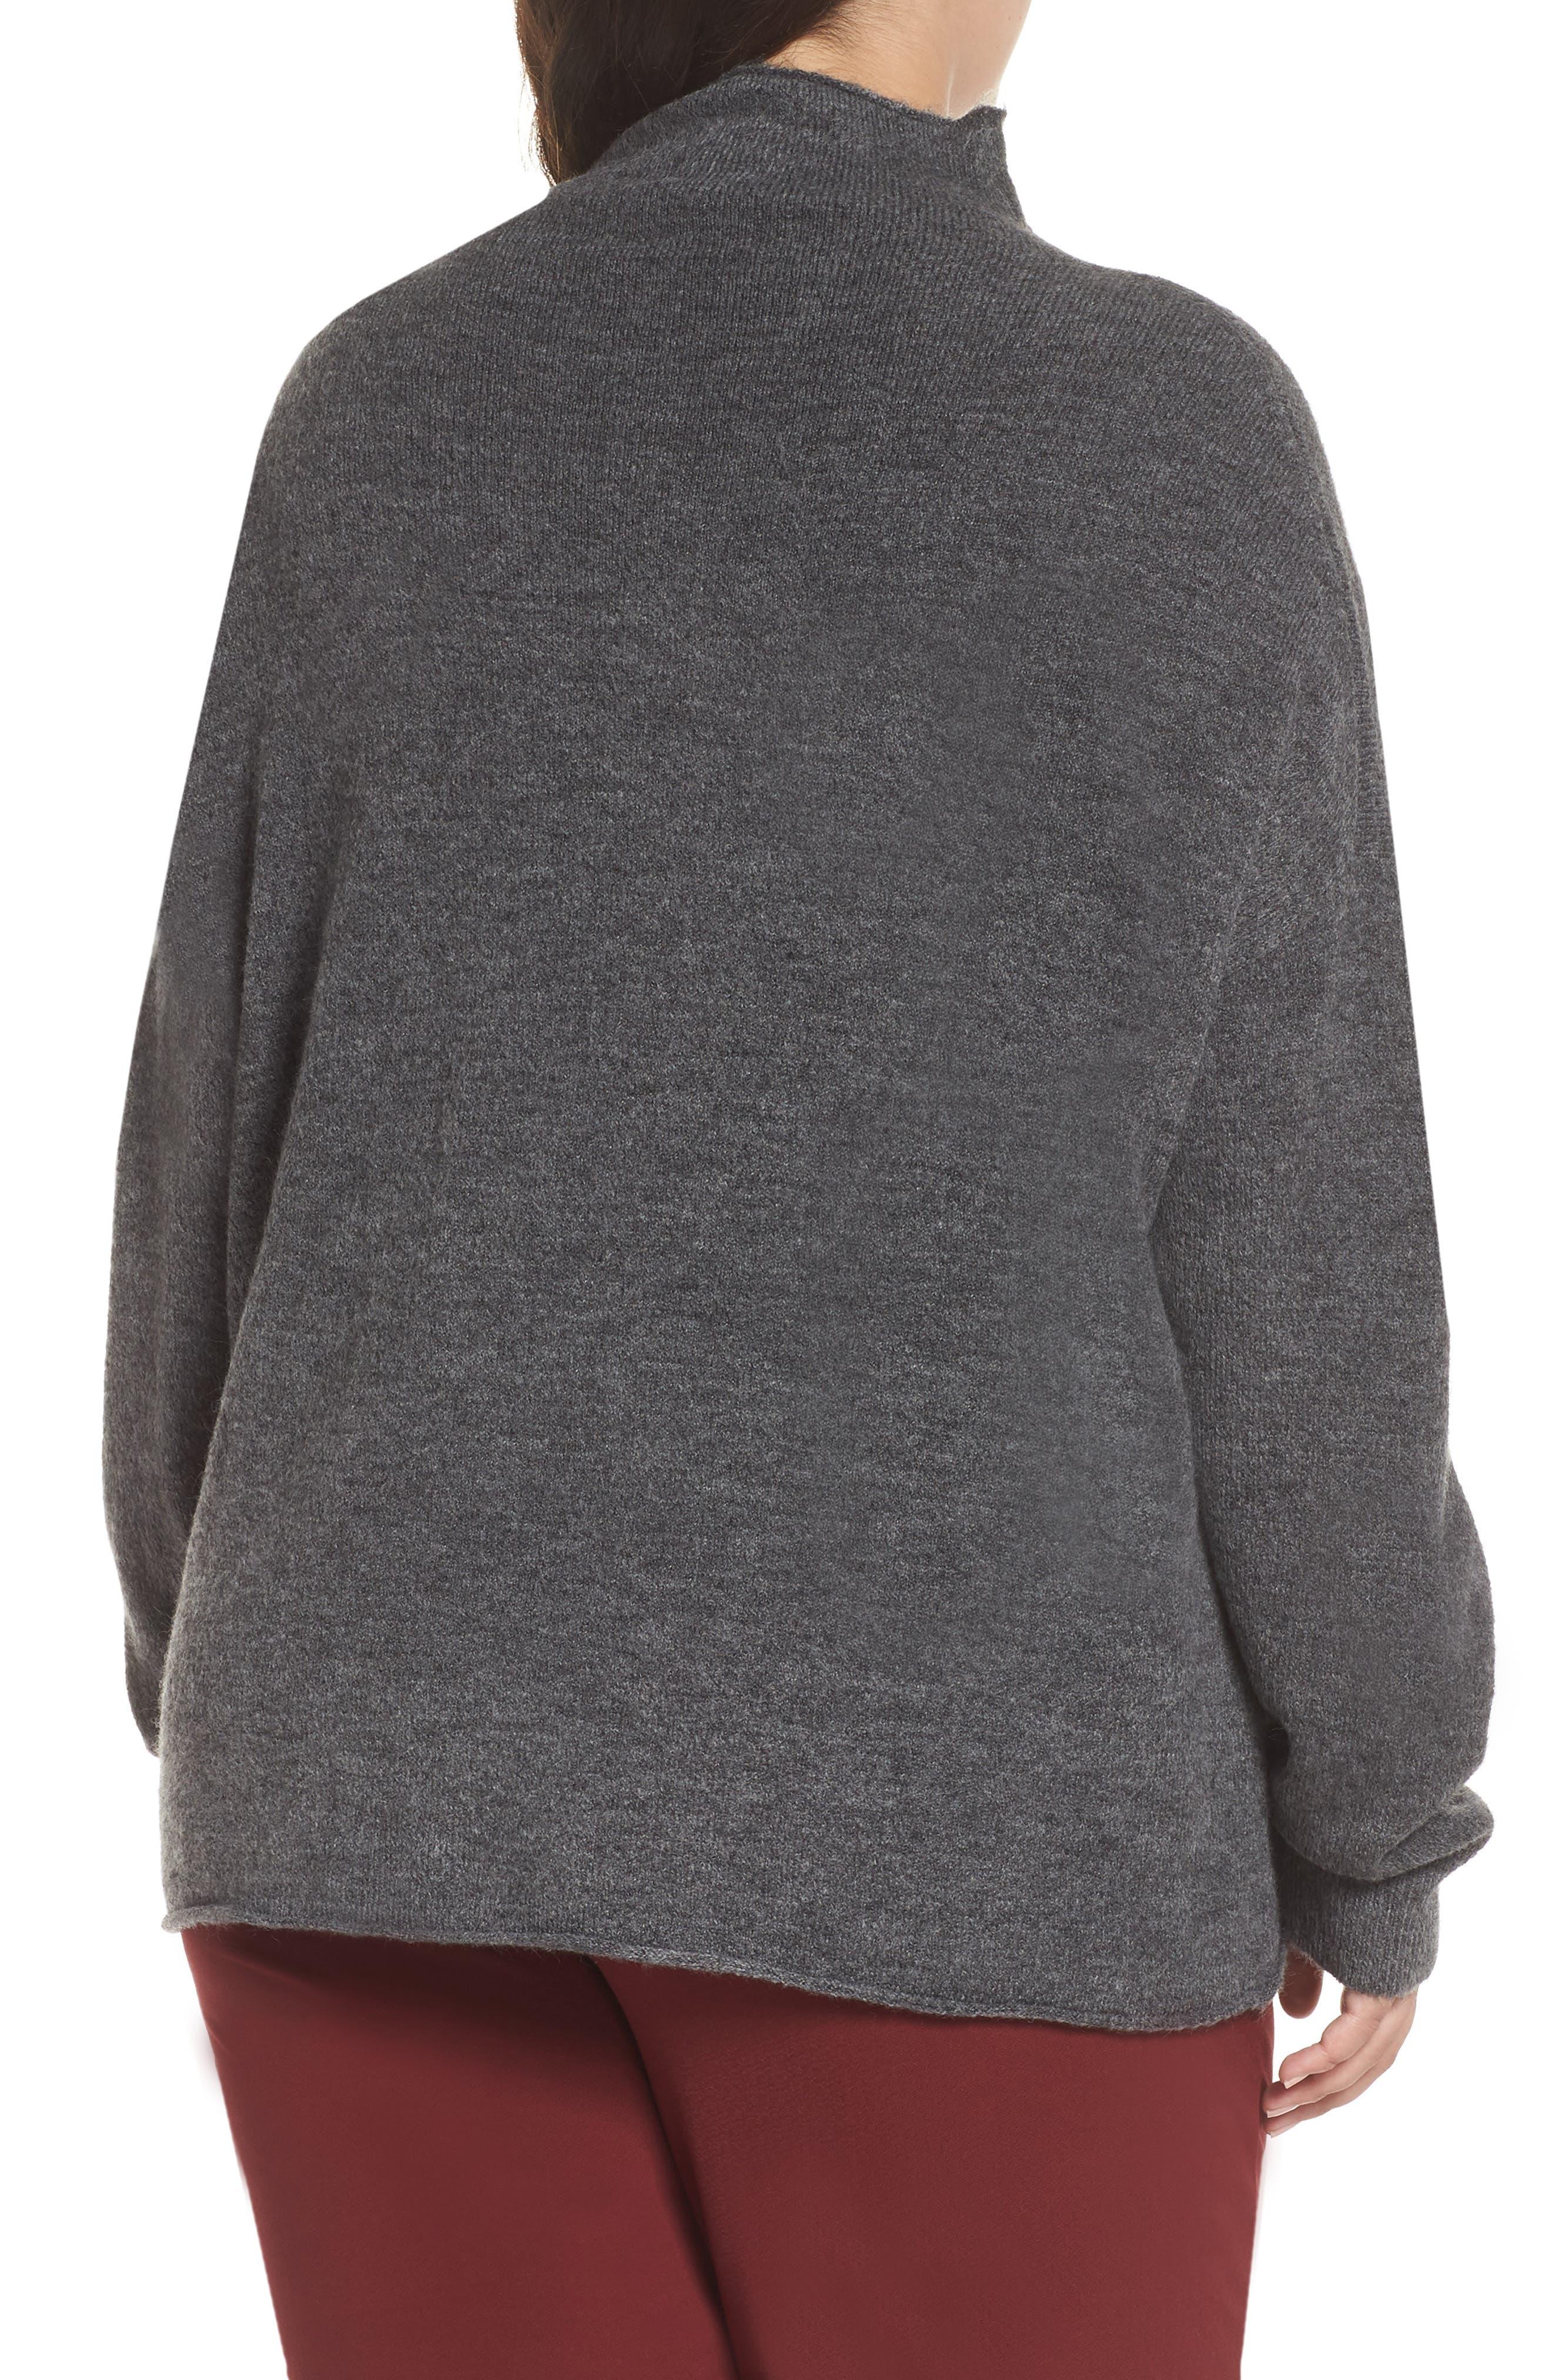 Cozy Mock Neck Sweater,                             Alternate thumbnail 3, color,                             GREY MEDIUM CHARCOAL HEATHER